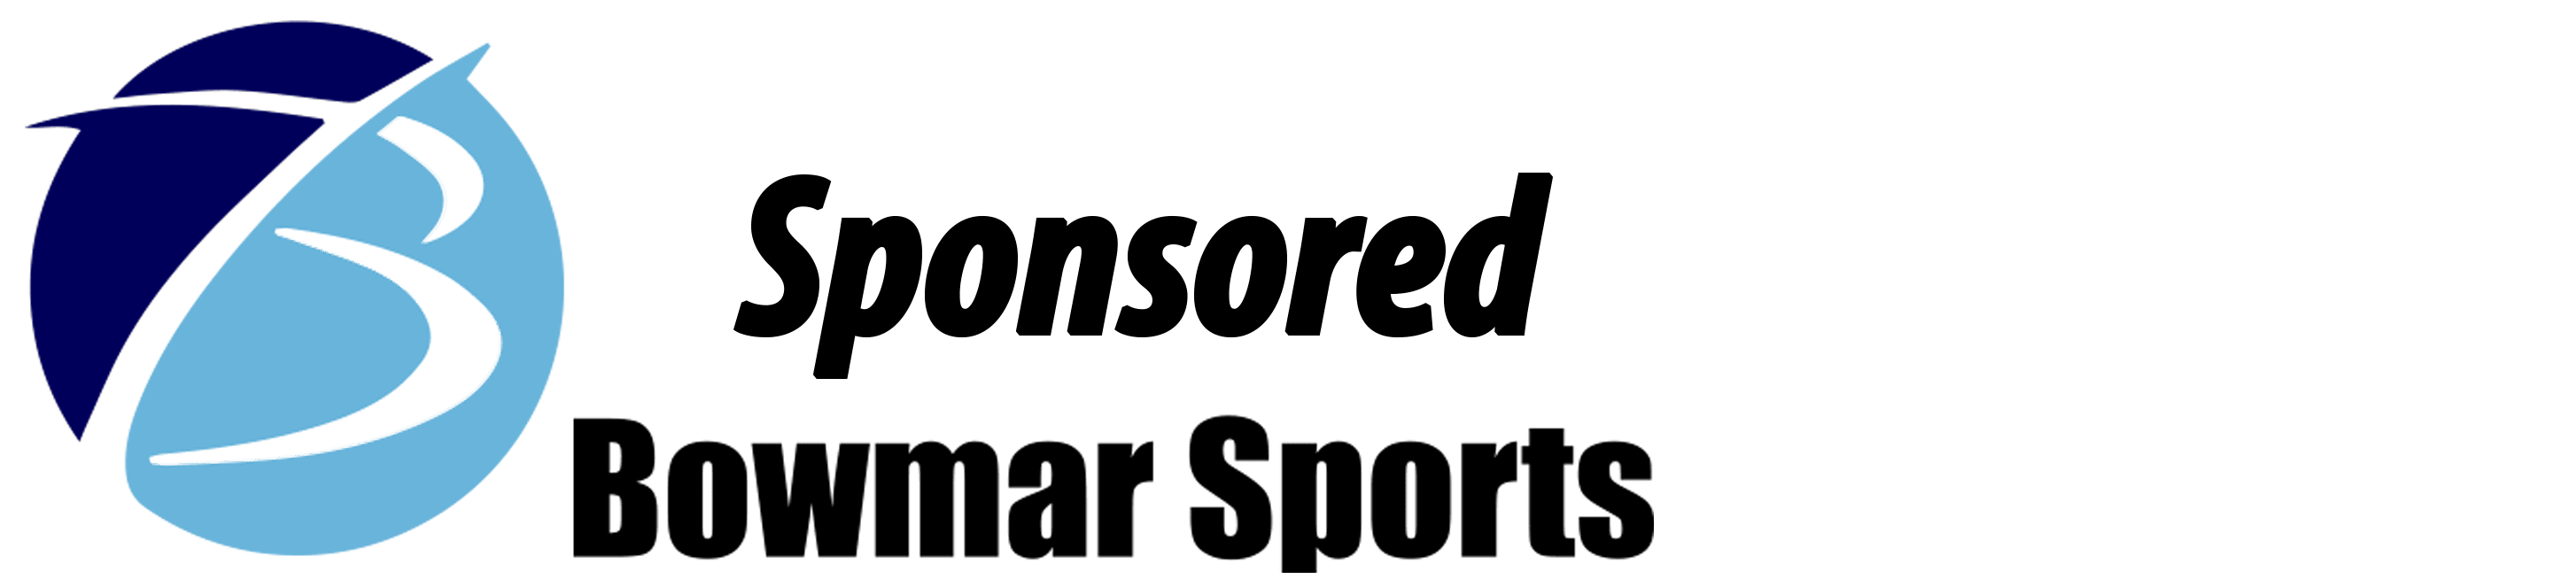 bowmarsports sponsored